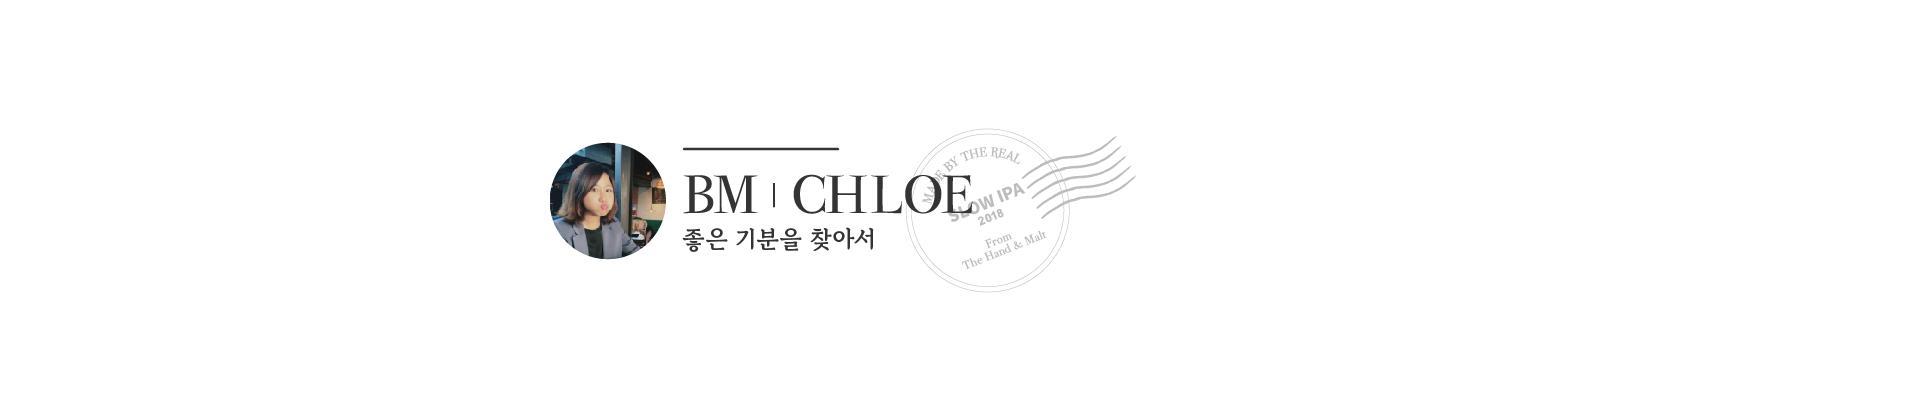 NAME TAG_CHLOE.jpg